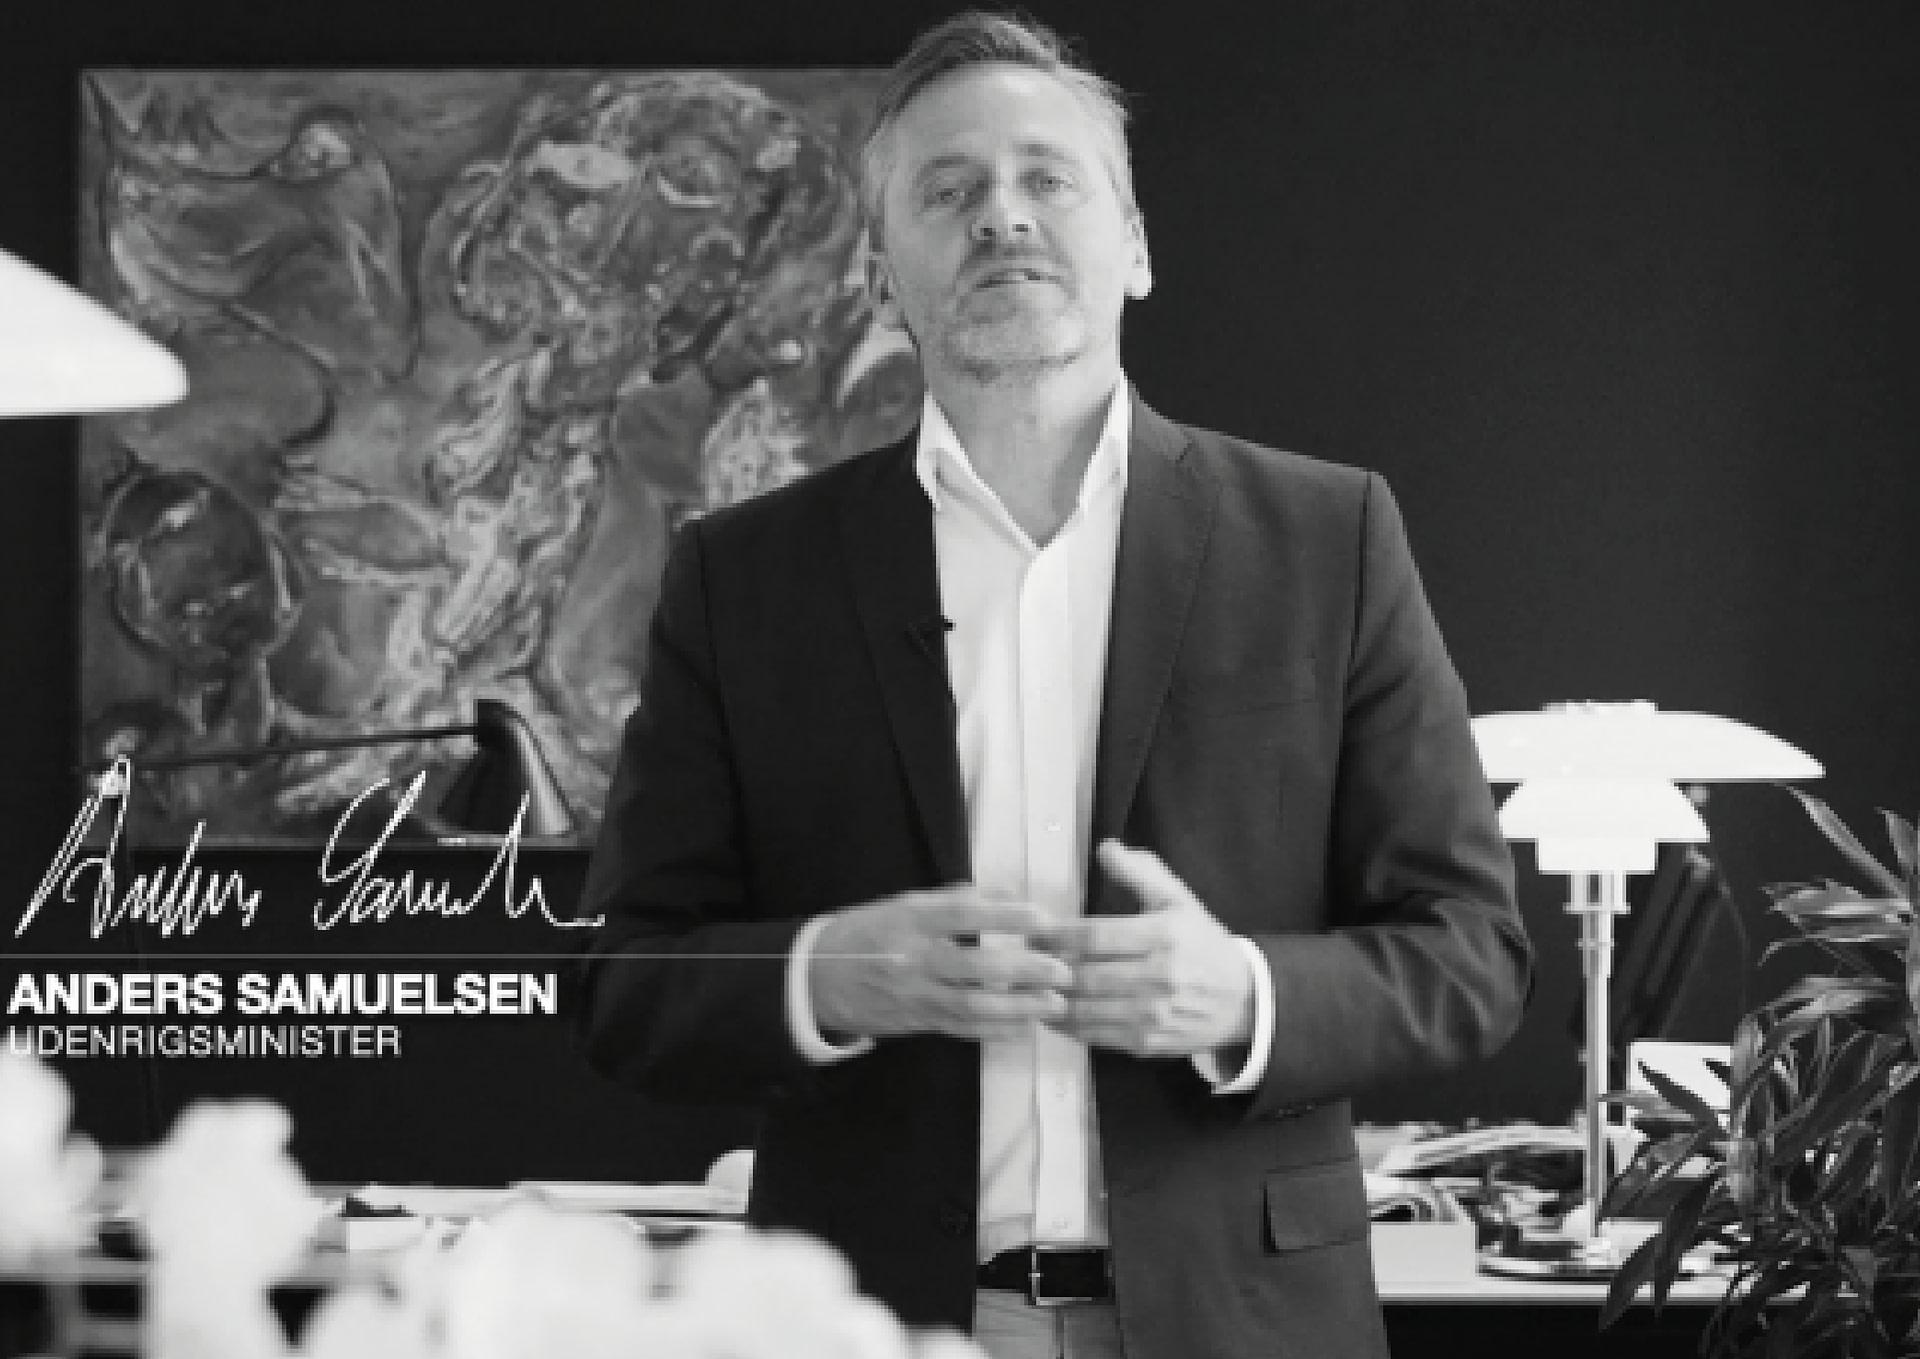 Liberal Alliance – Anders Samuelsen